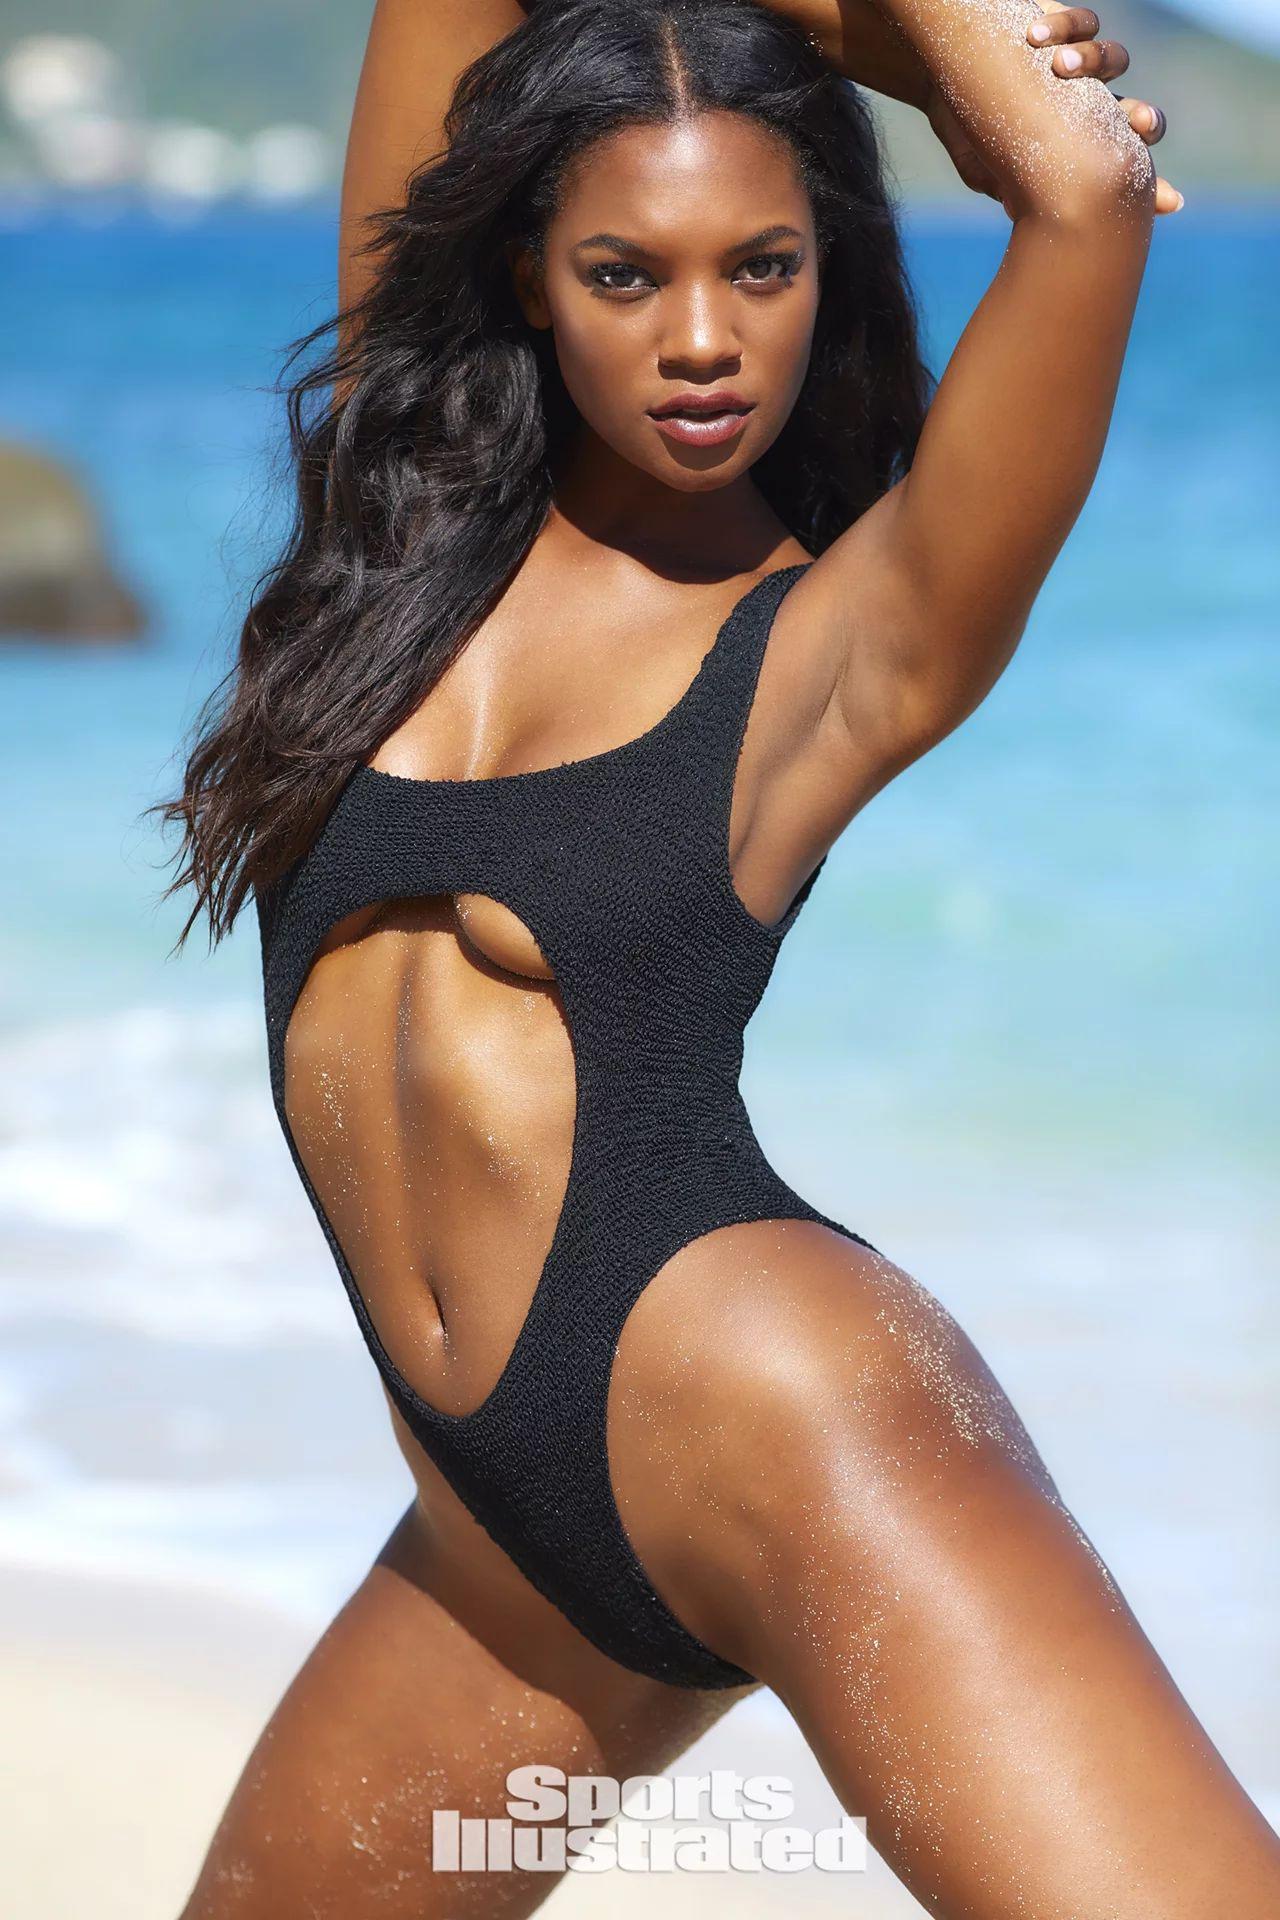 XXX Jasmyn Wilkins nude (25 photo), Topless, Paparazzi, Feet, swimsuit 2006